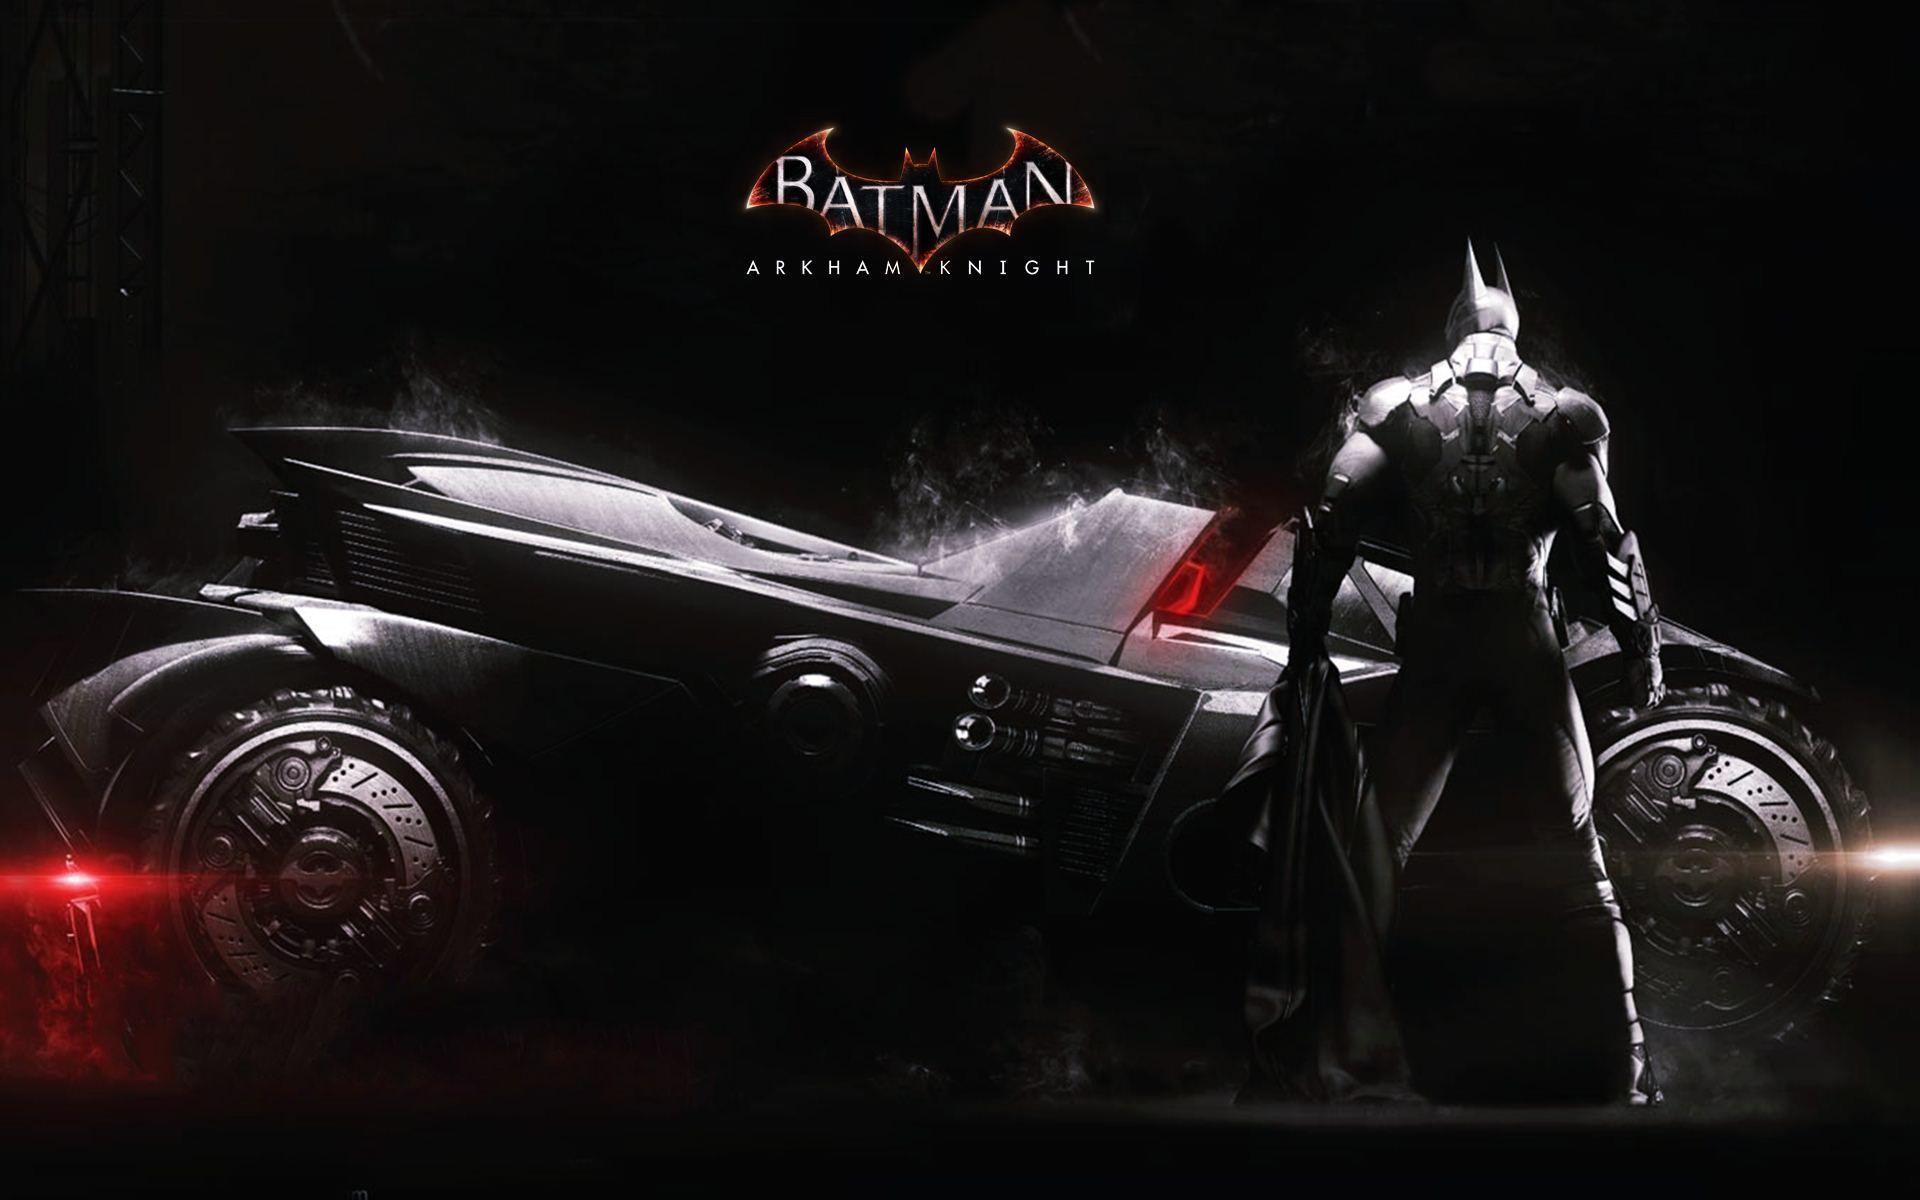 2014 batman arkham knight batmobile exclusive hd wallpapers